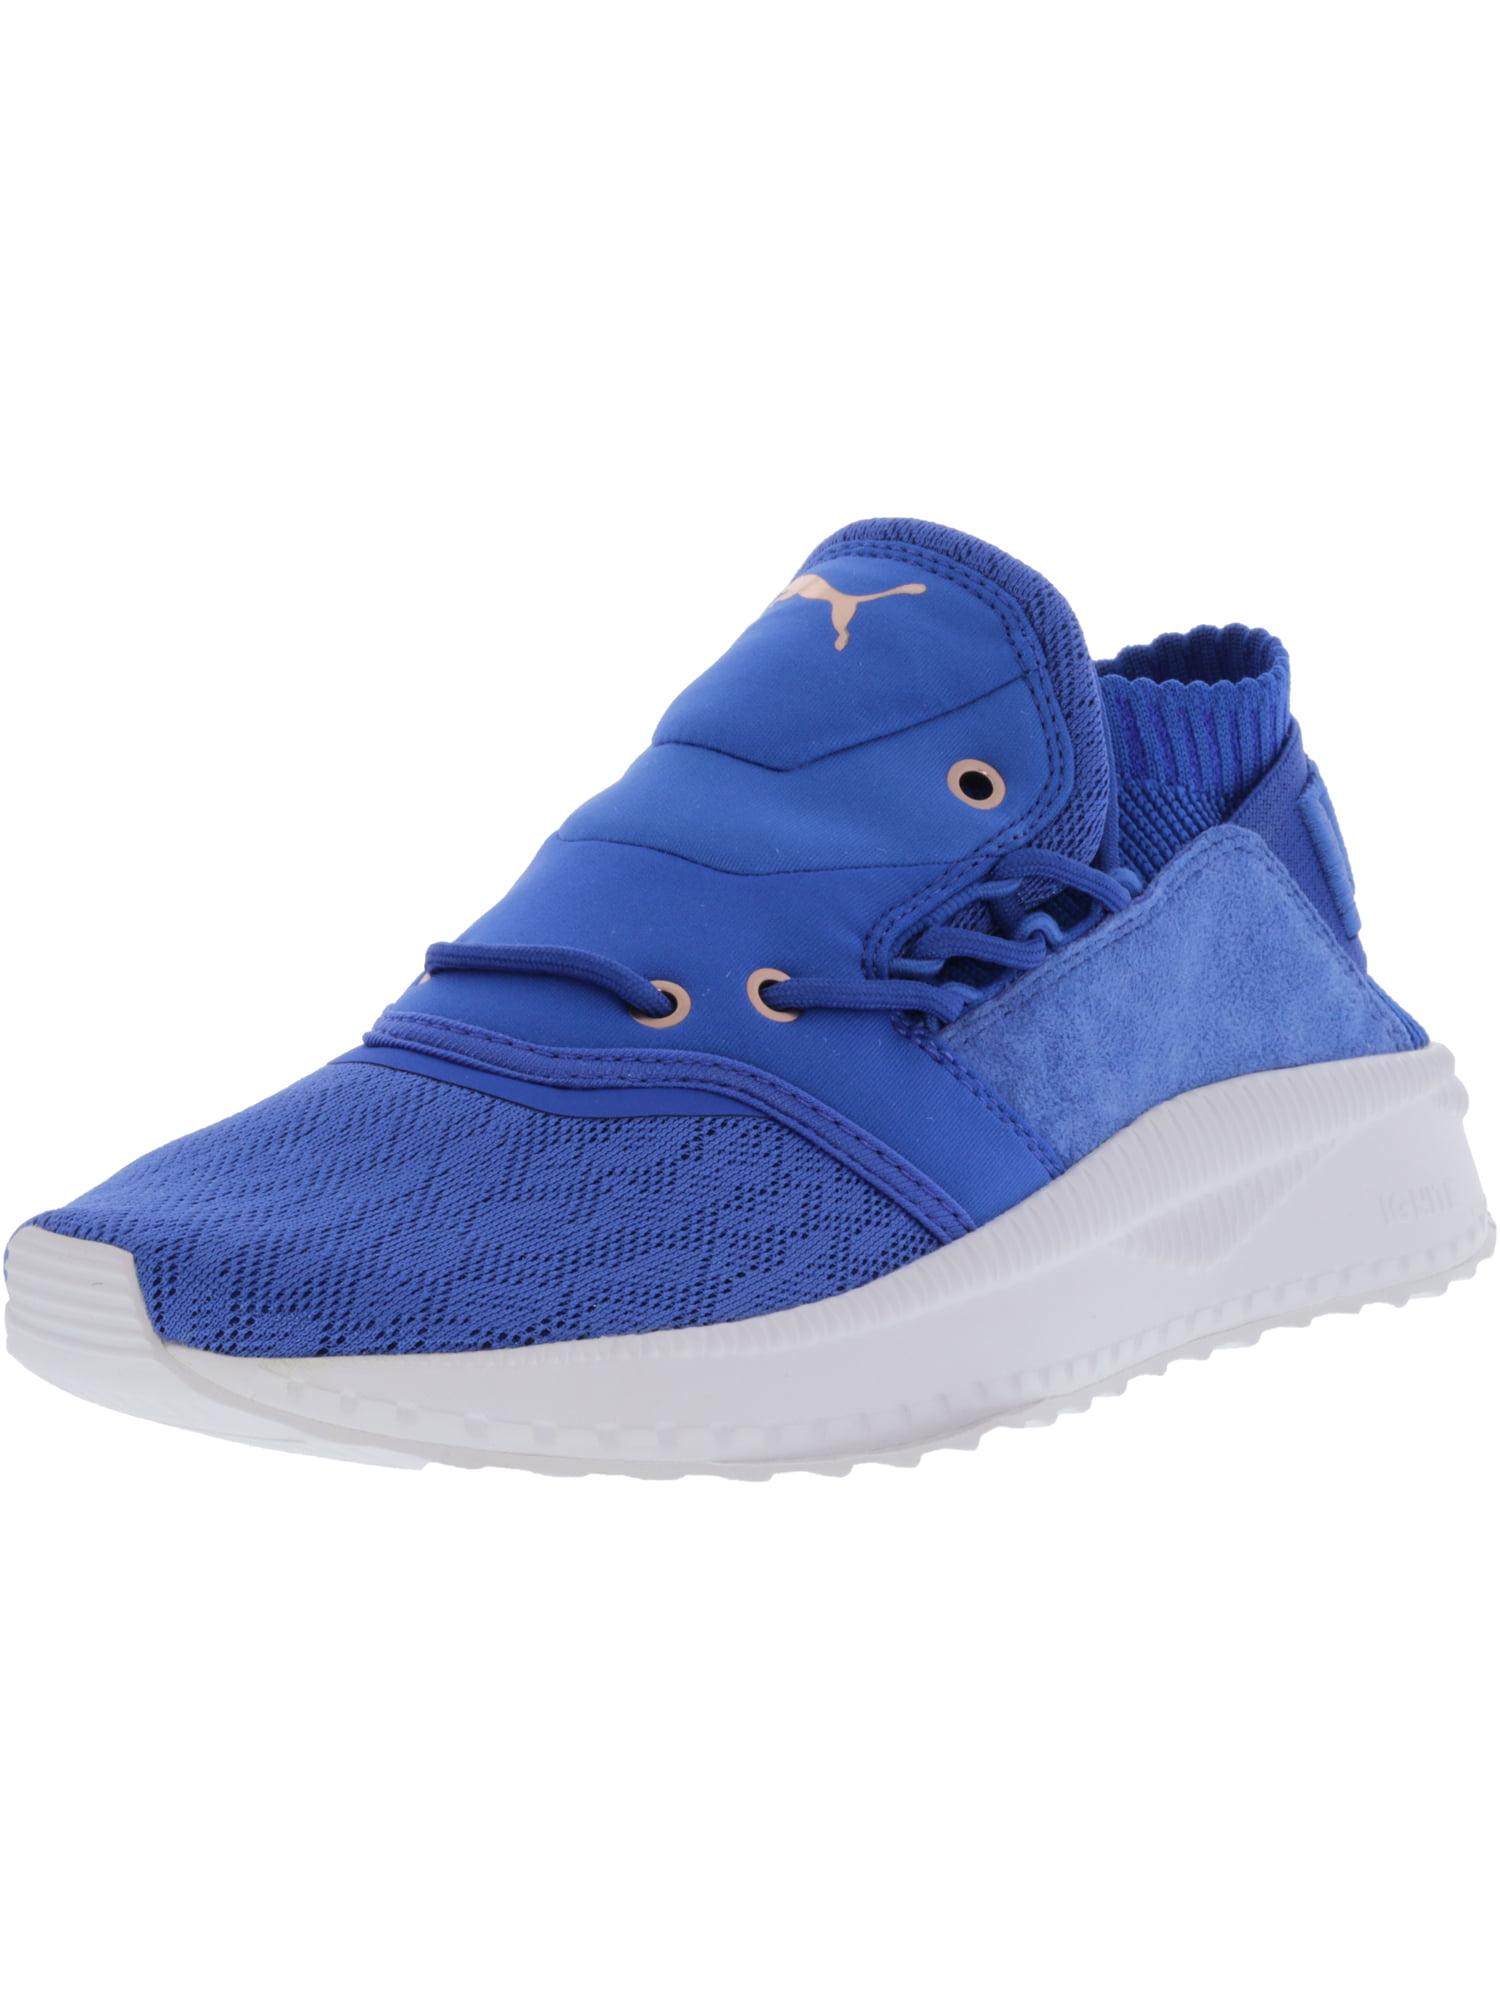 Puma Women's Tsugi Shinsei Lapis Blue / Ankle-High Fabric Training Shoes - 10.5M